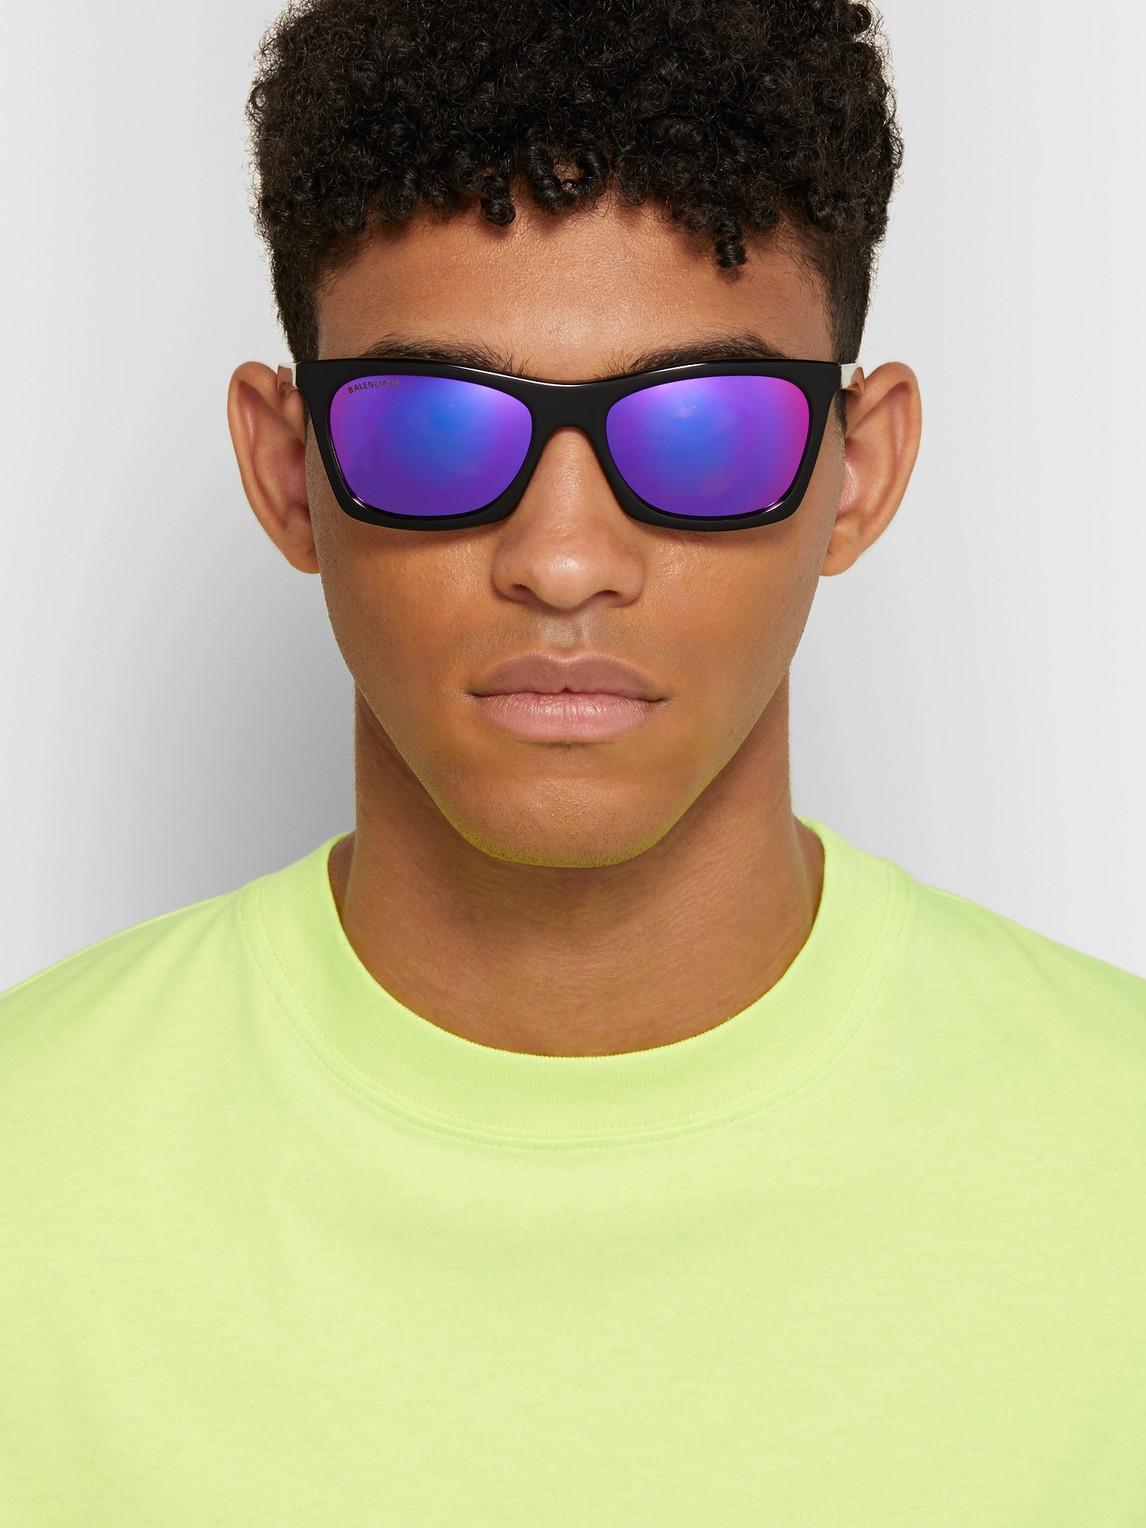 Balenciaga Sunglasses D-FRAME ACETATE AND SILVER-TONE MIRRORED SUNGLASSES